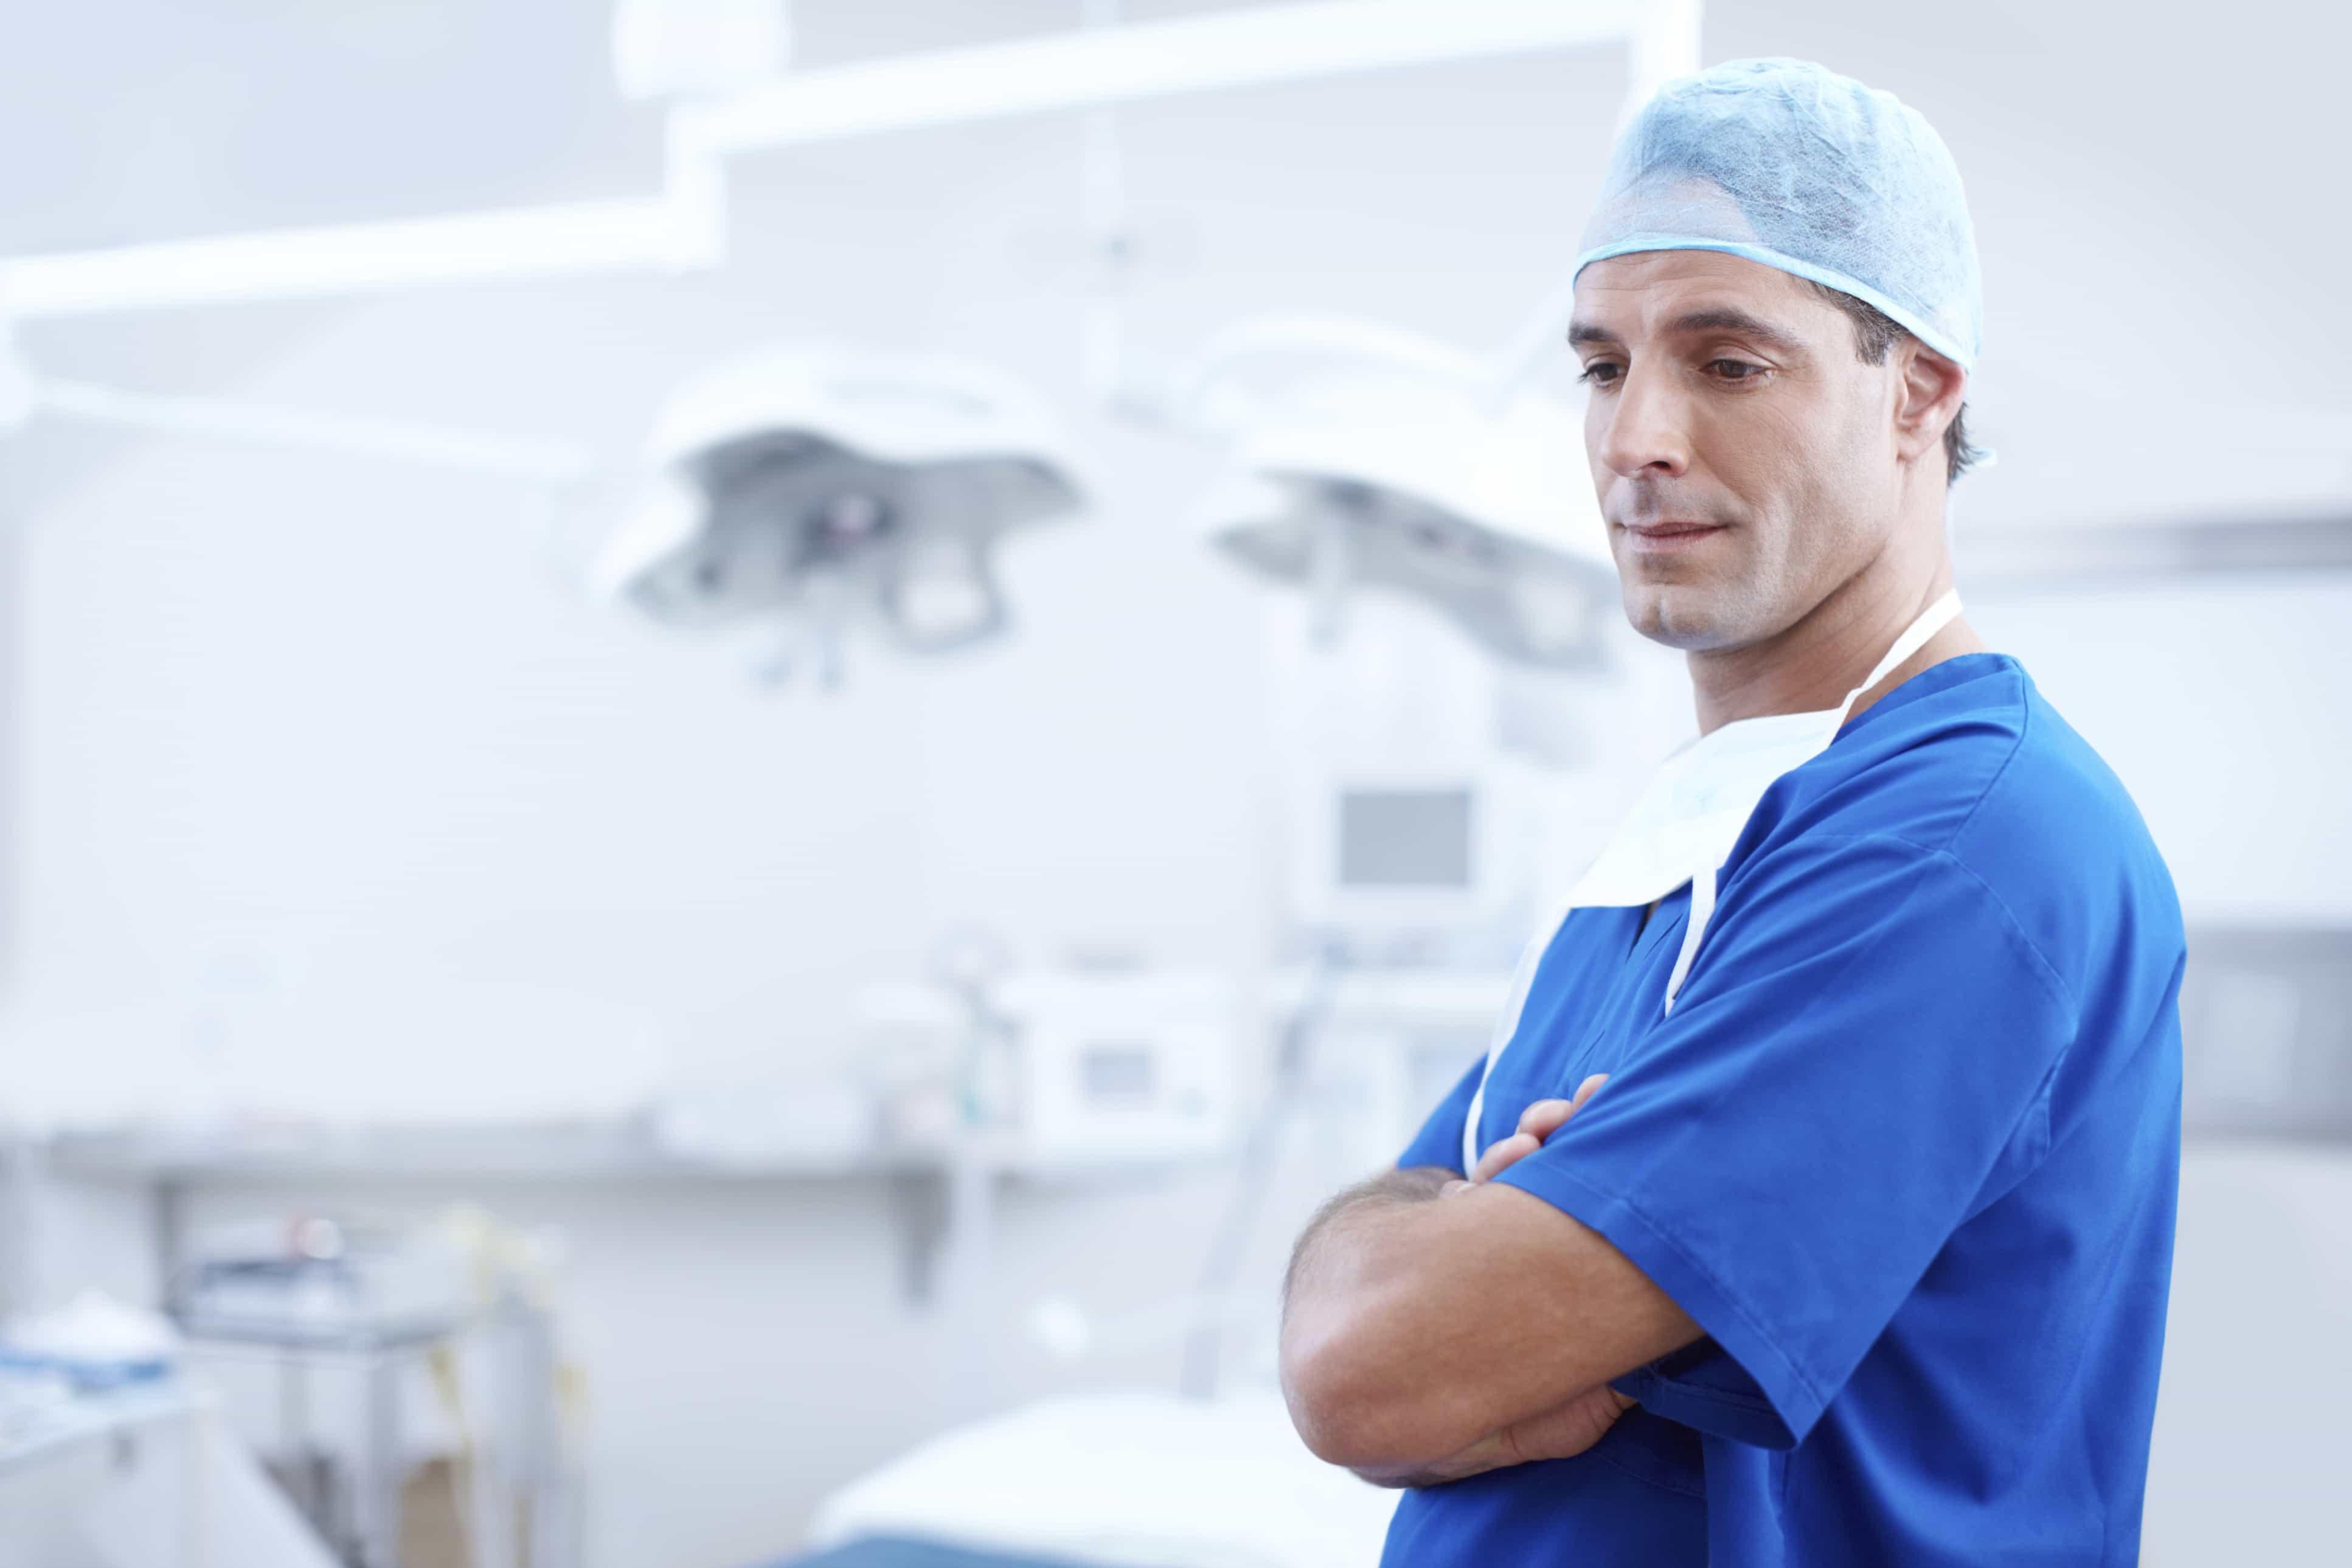 bewerbung als arzt bewerbung als assistenzarzt mediziner - Bewerbung Arzt